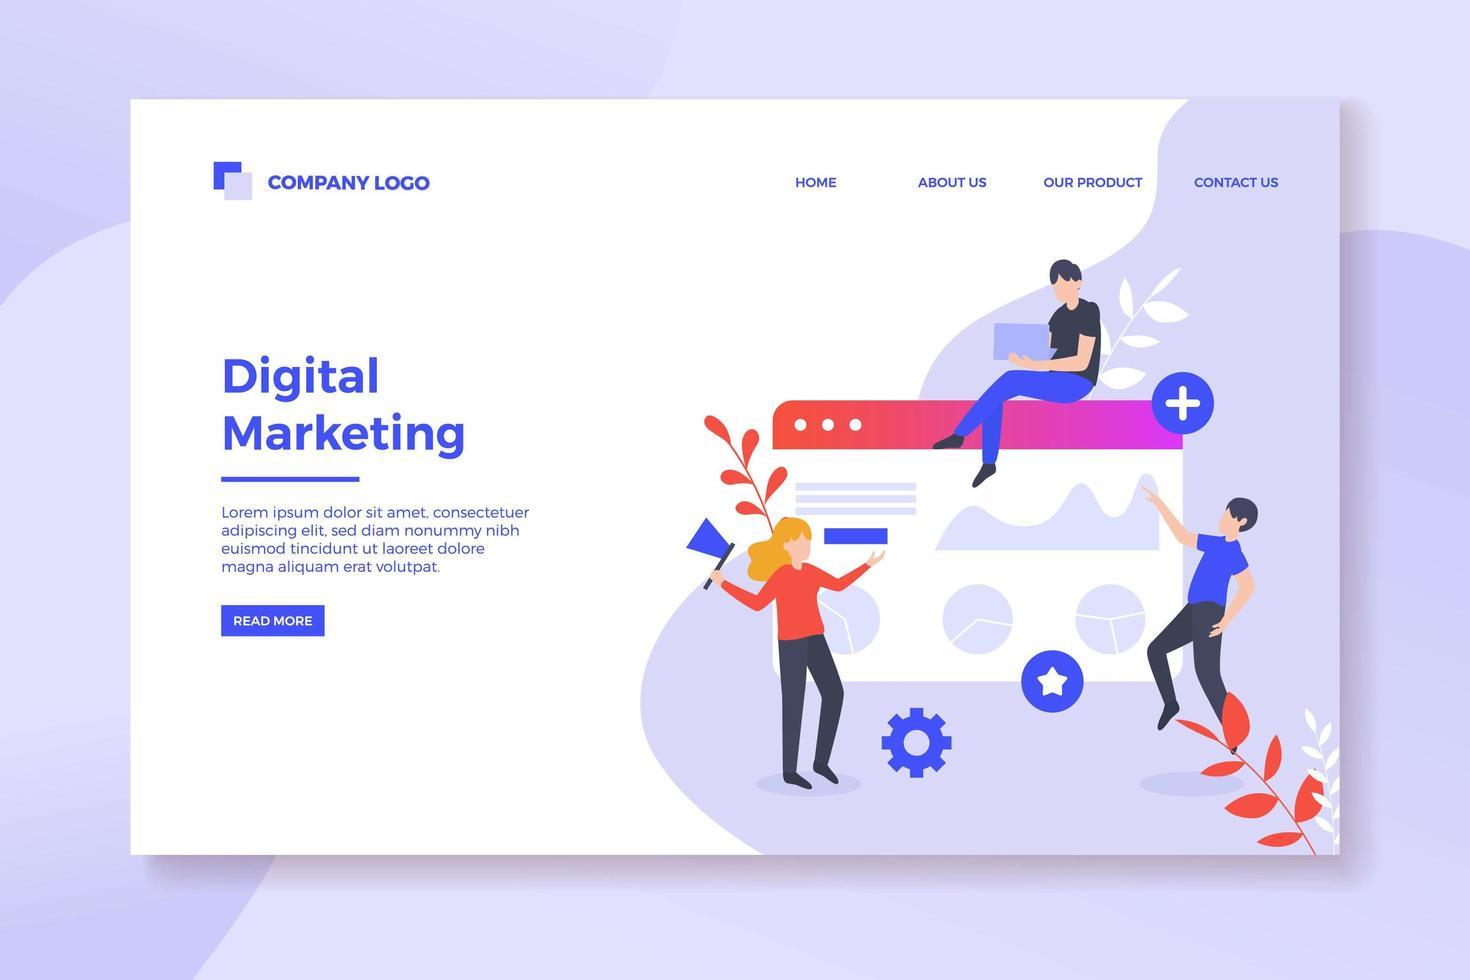 bestemmingspagina voor digitale marketing vector